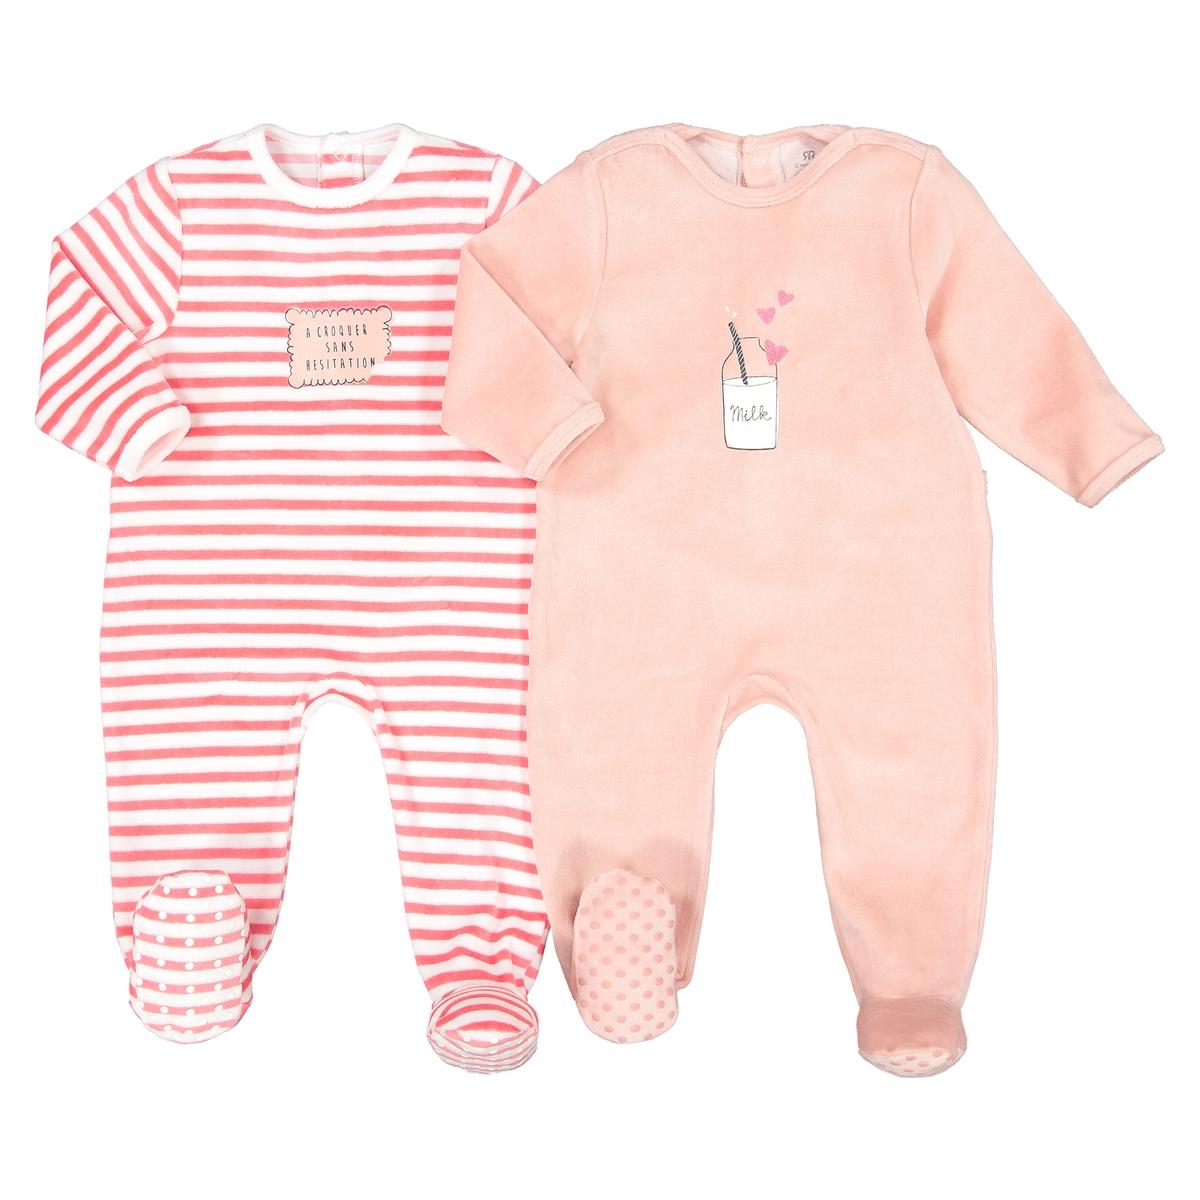 цена Пижамы La Redoute Из велюра мес - года 0 мес. - 50 см розовый